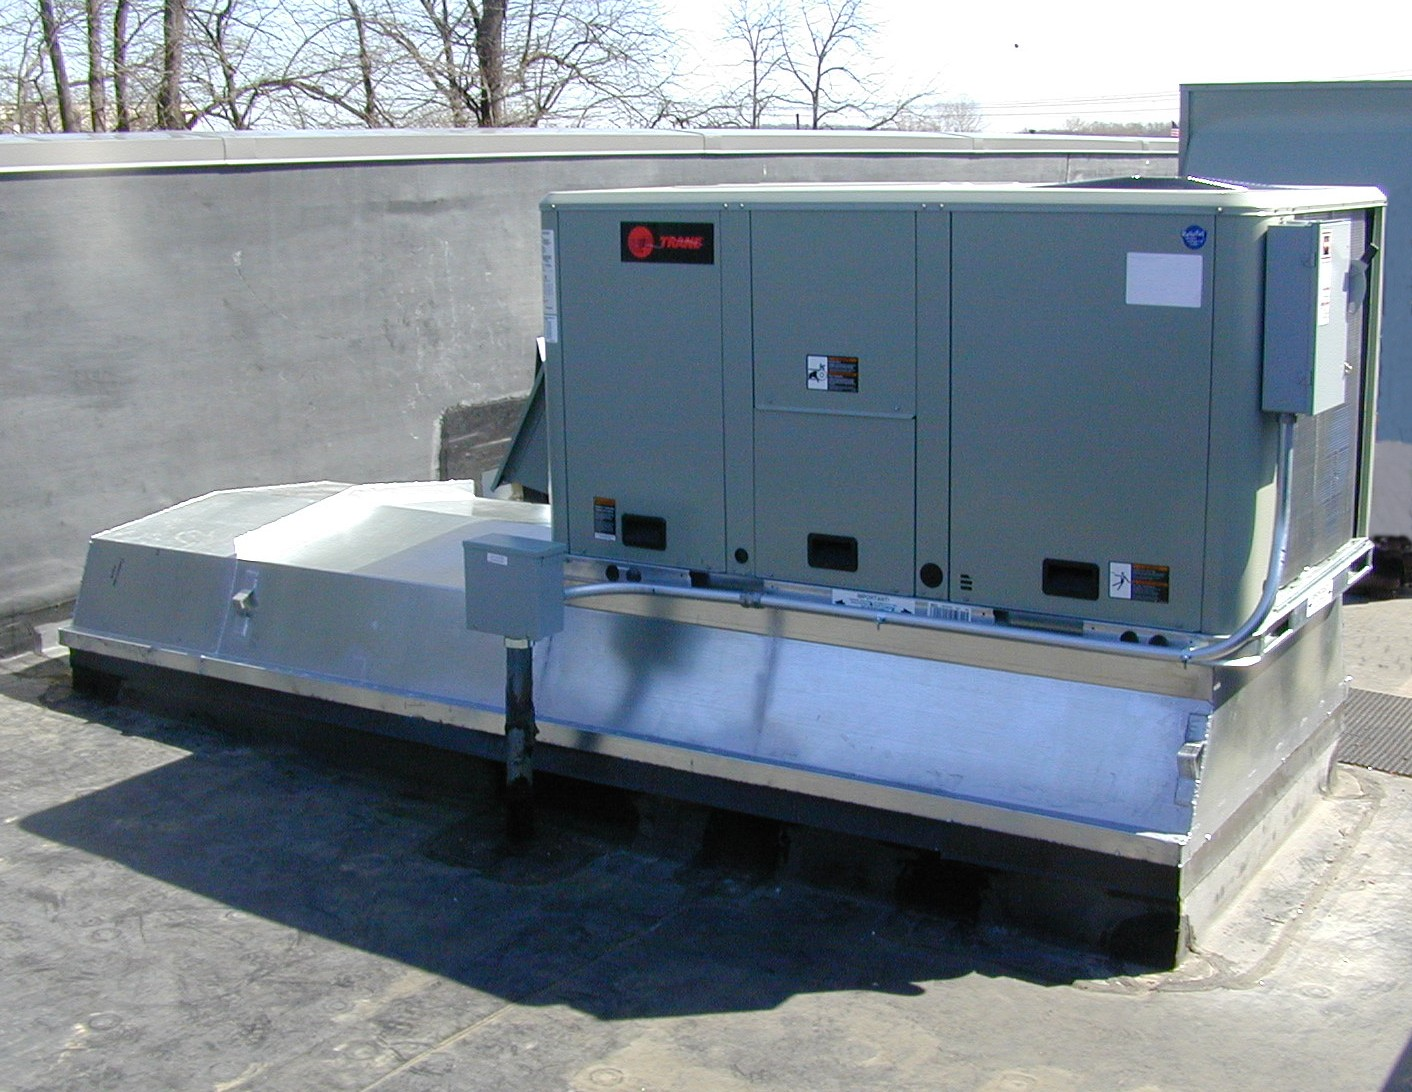 trane el paso vauxhall zafira fuse box diagram 2005 superior air systems inc 5 ton curb adapter image proview